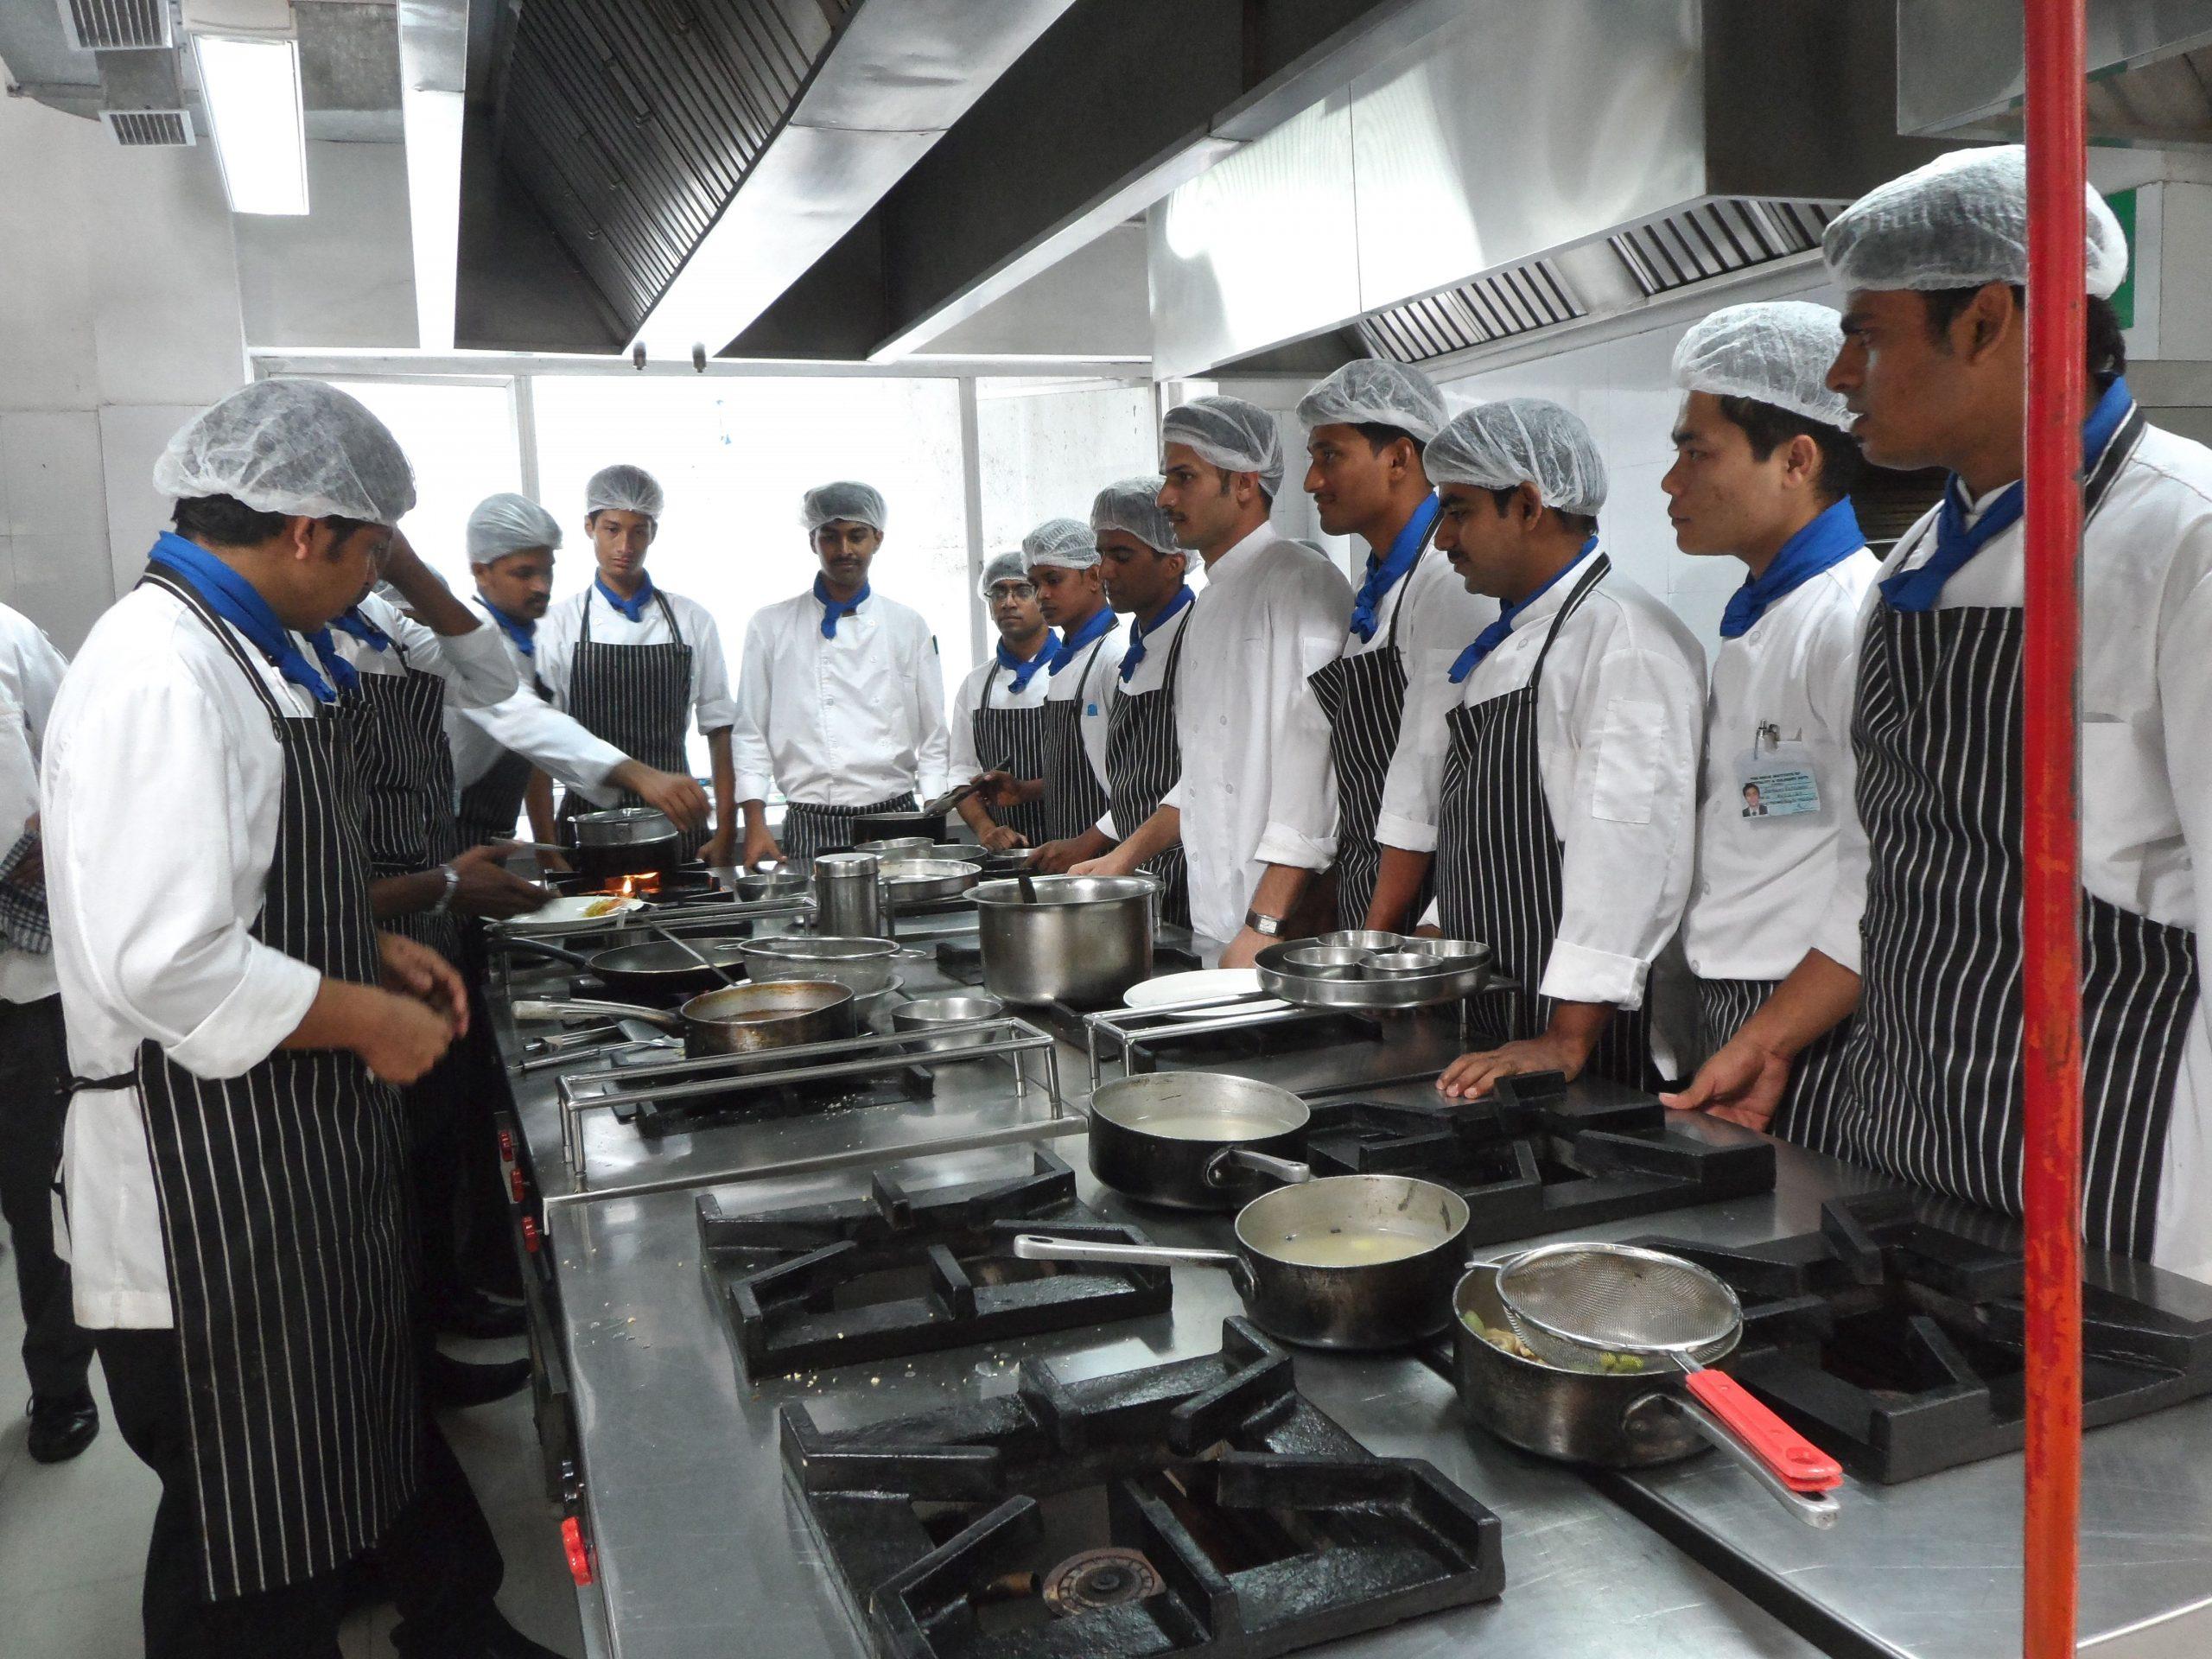 Student Chefs1